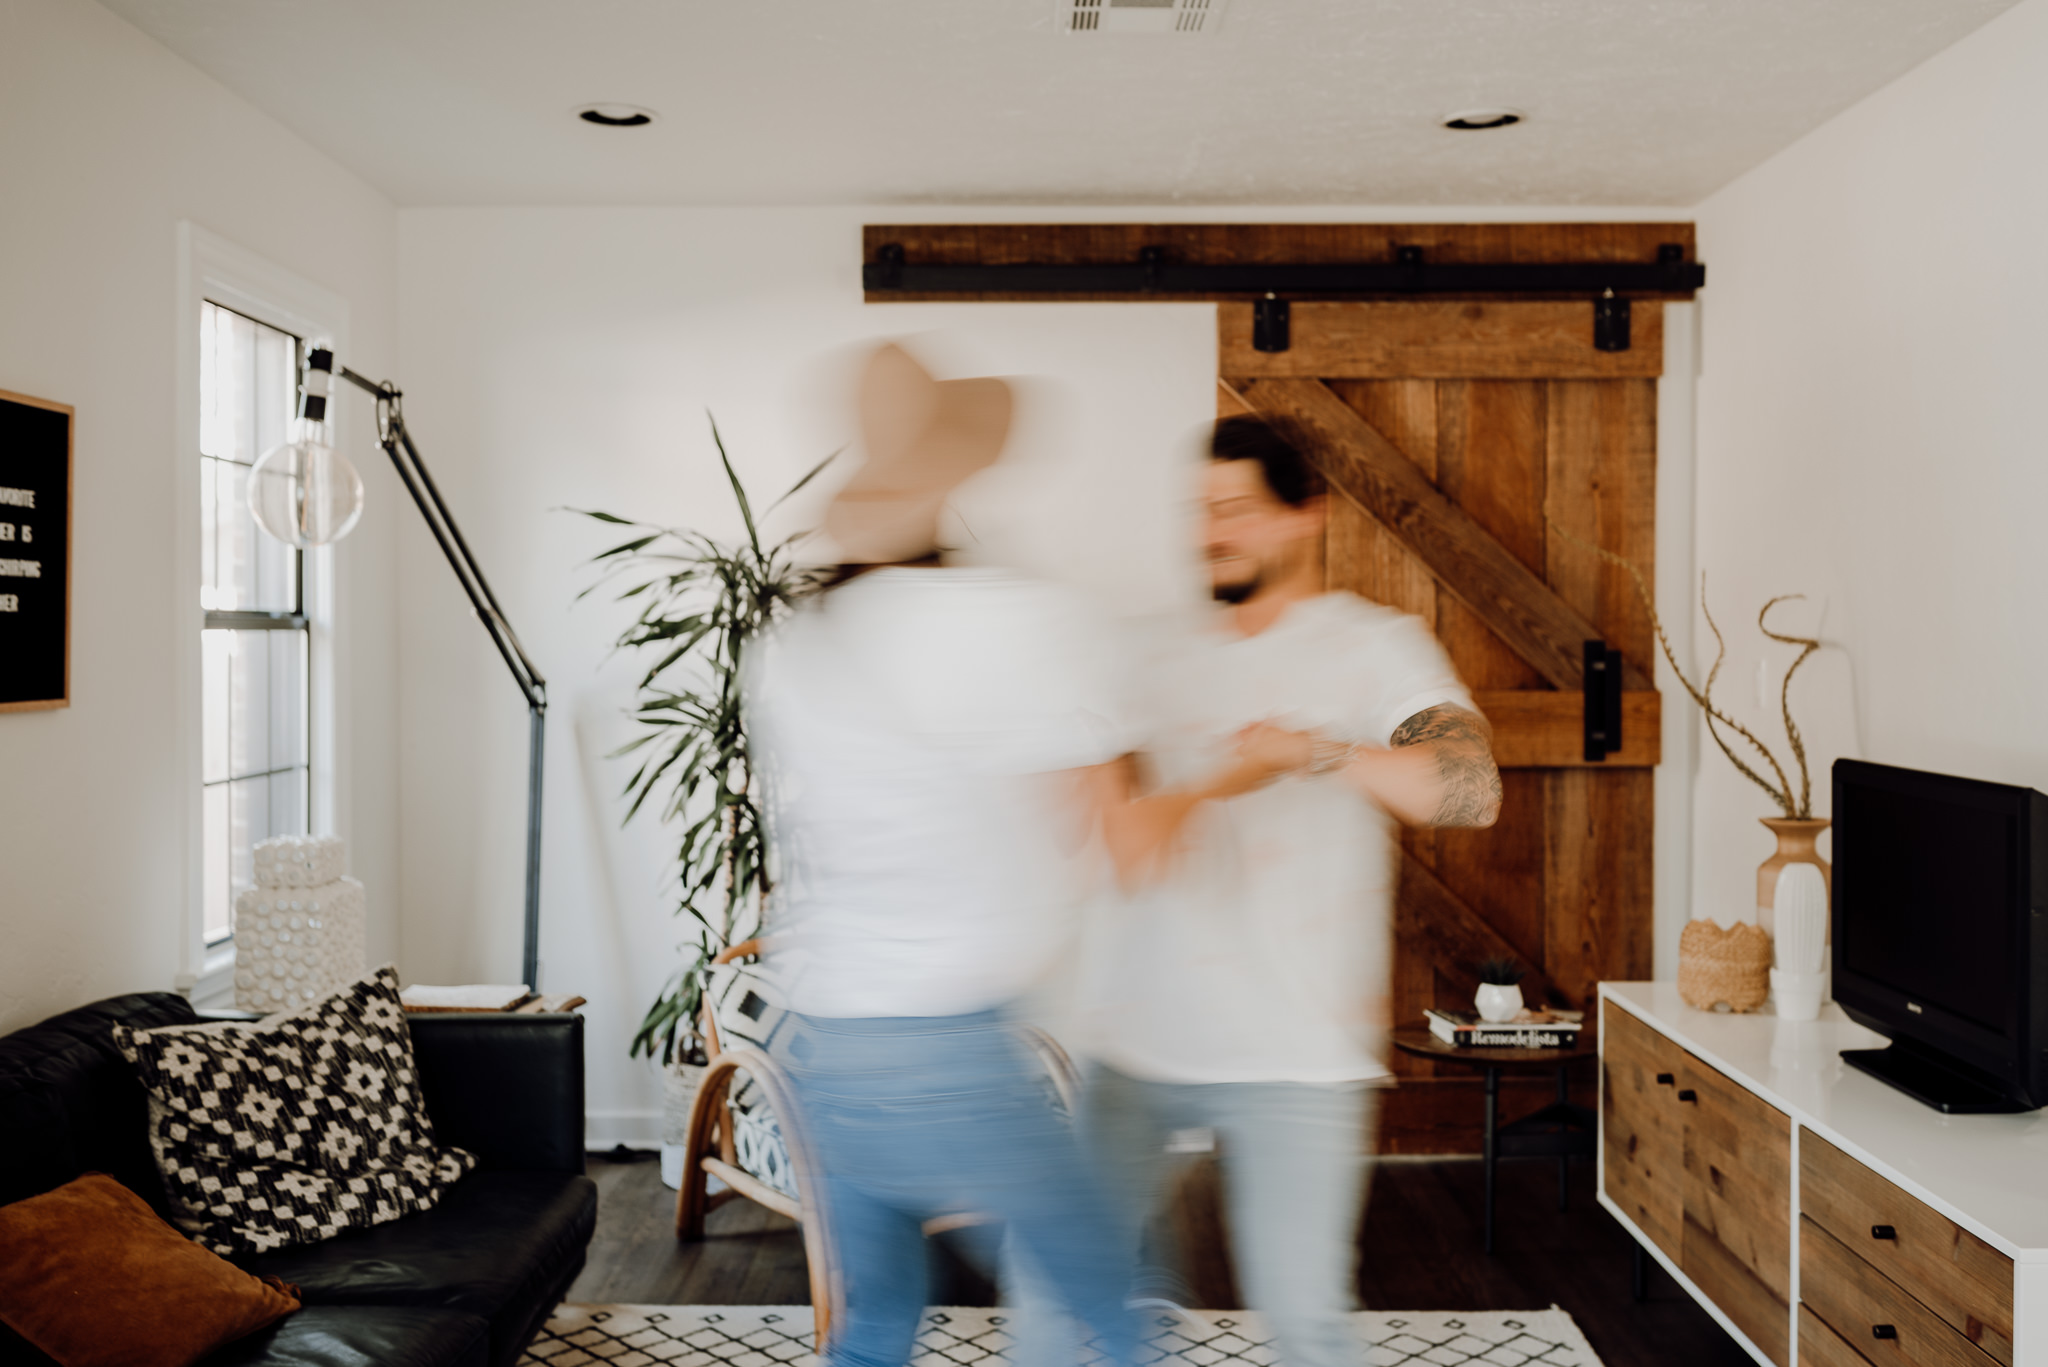 kristen giles photography | texas-wedding-elopement-photographer-oklahoma airbnb session-28-blog.jpg